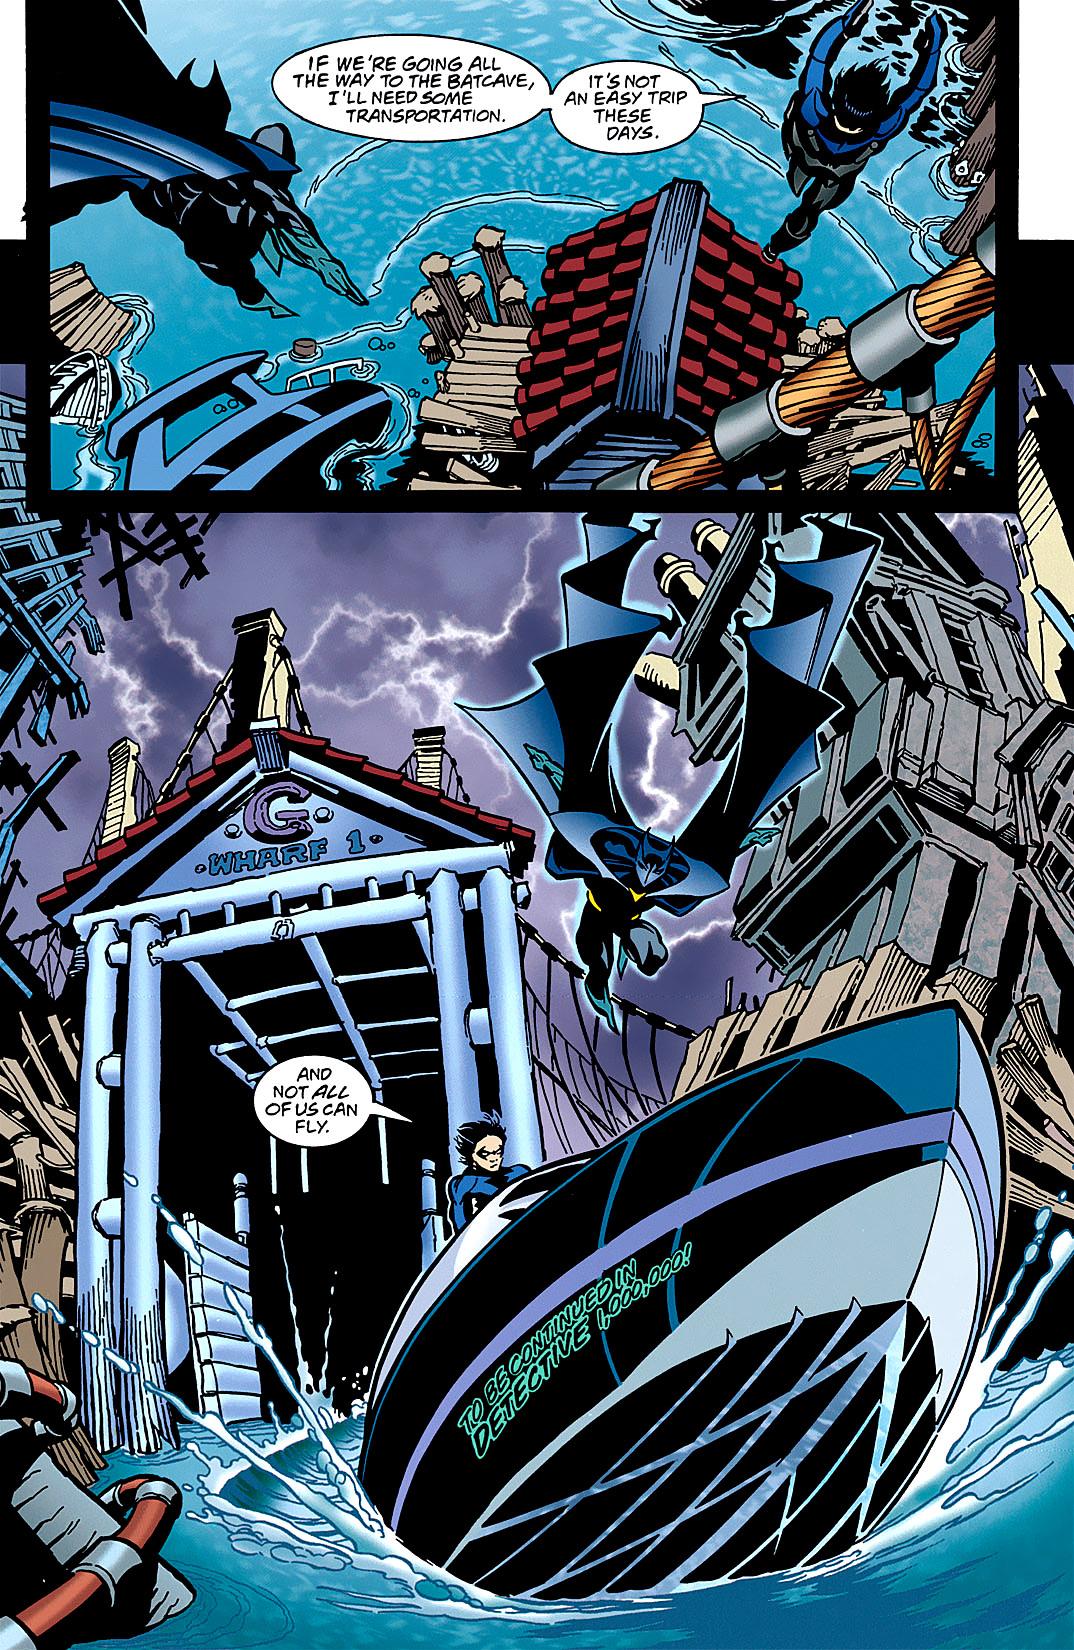 Nightwing (1996) chap 1000000 pic 23